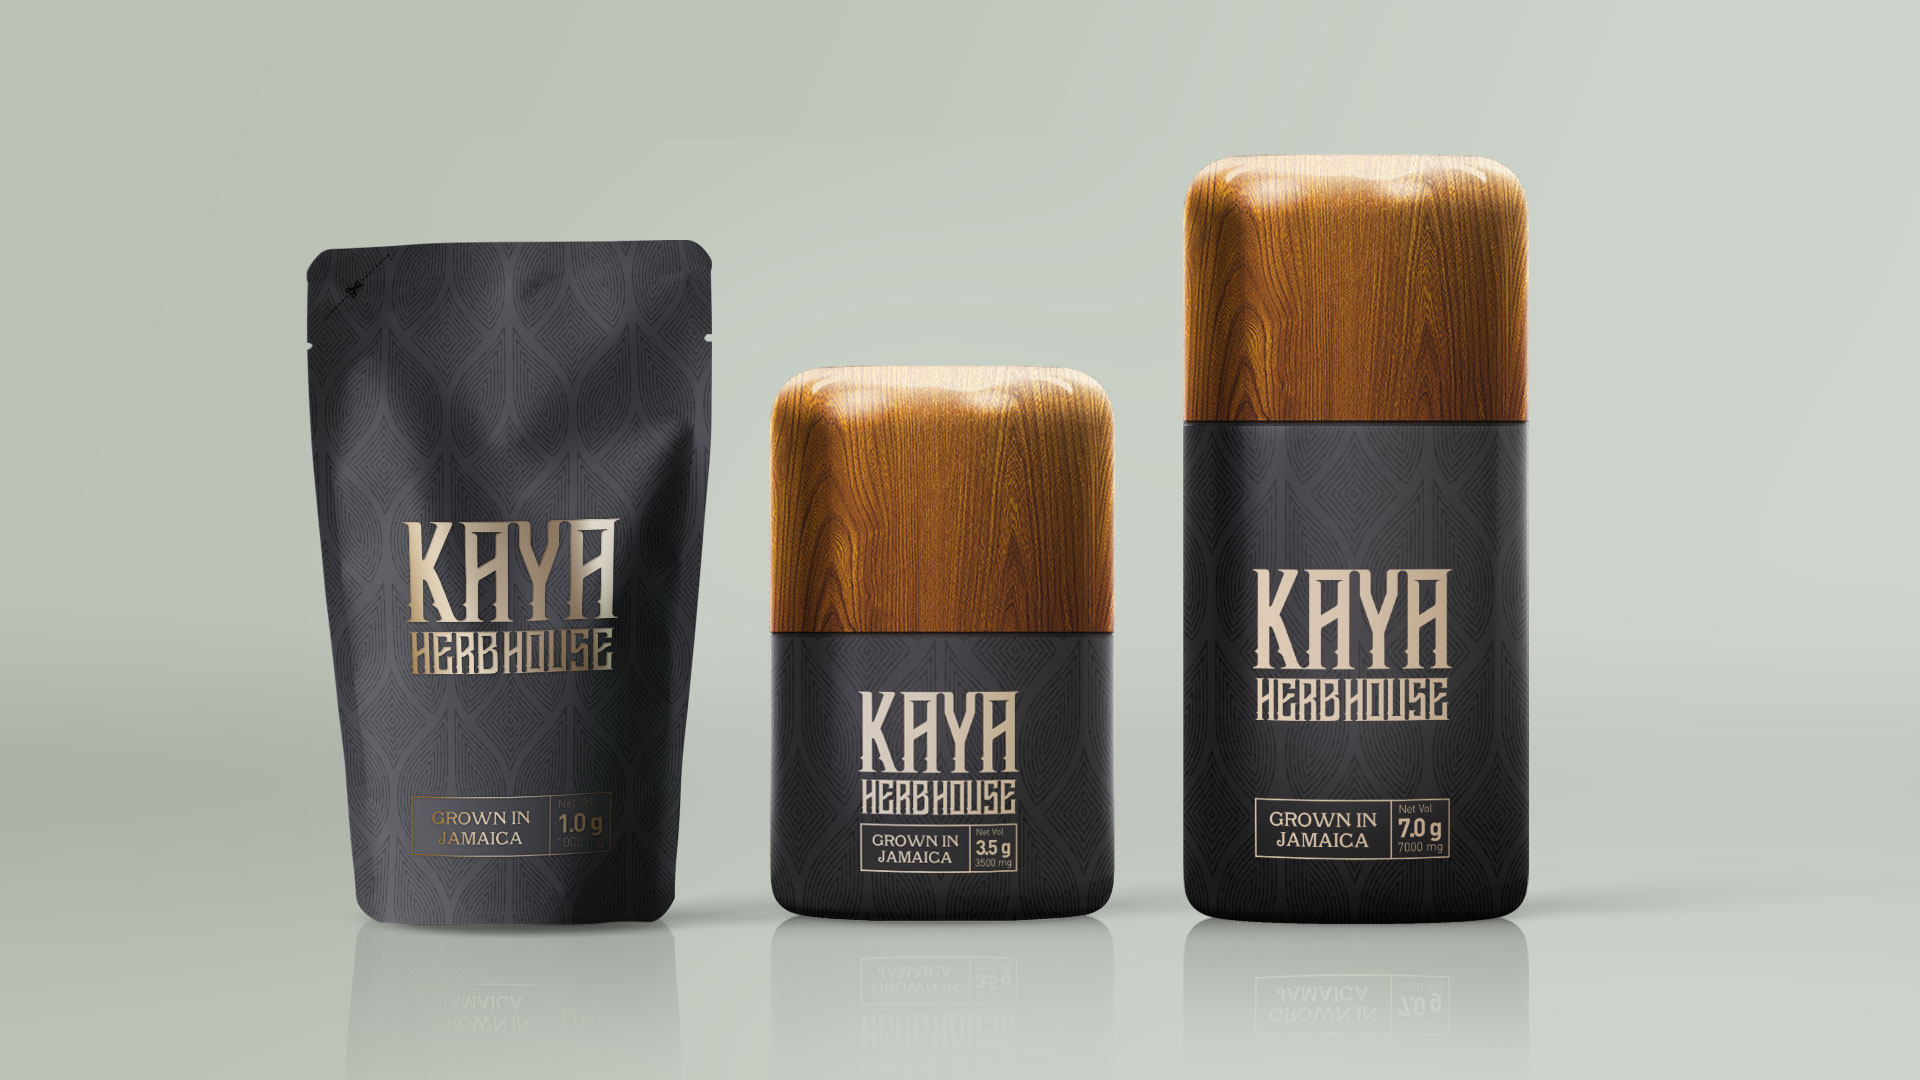 New Packaging Design for Kaya Herb House – Jamaica